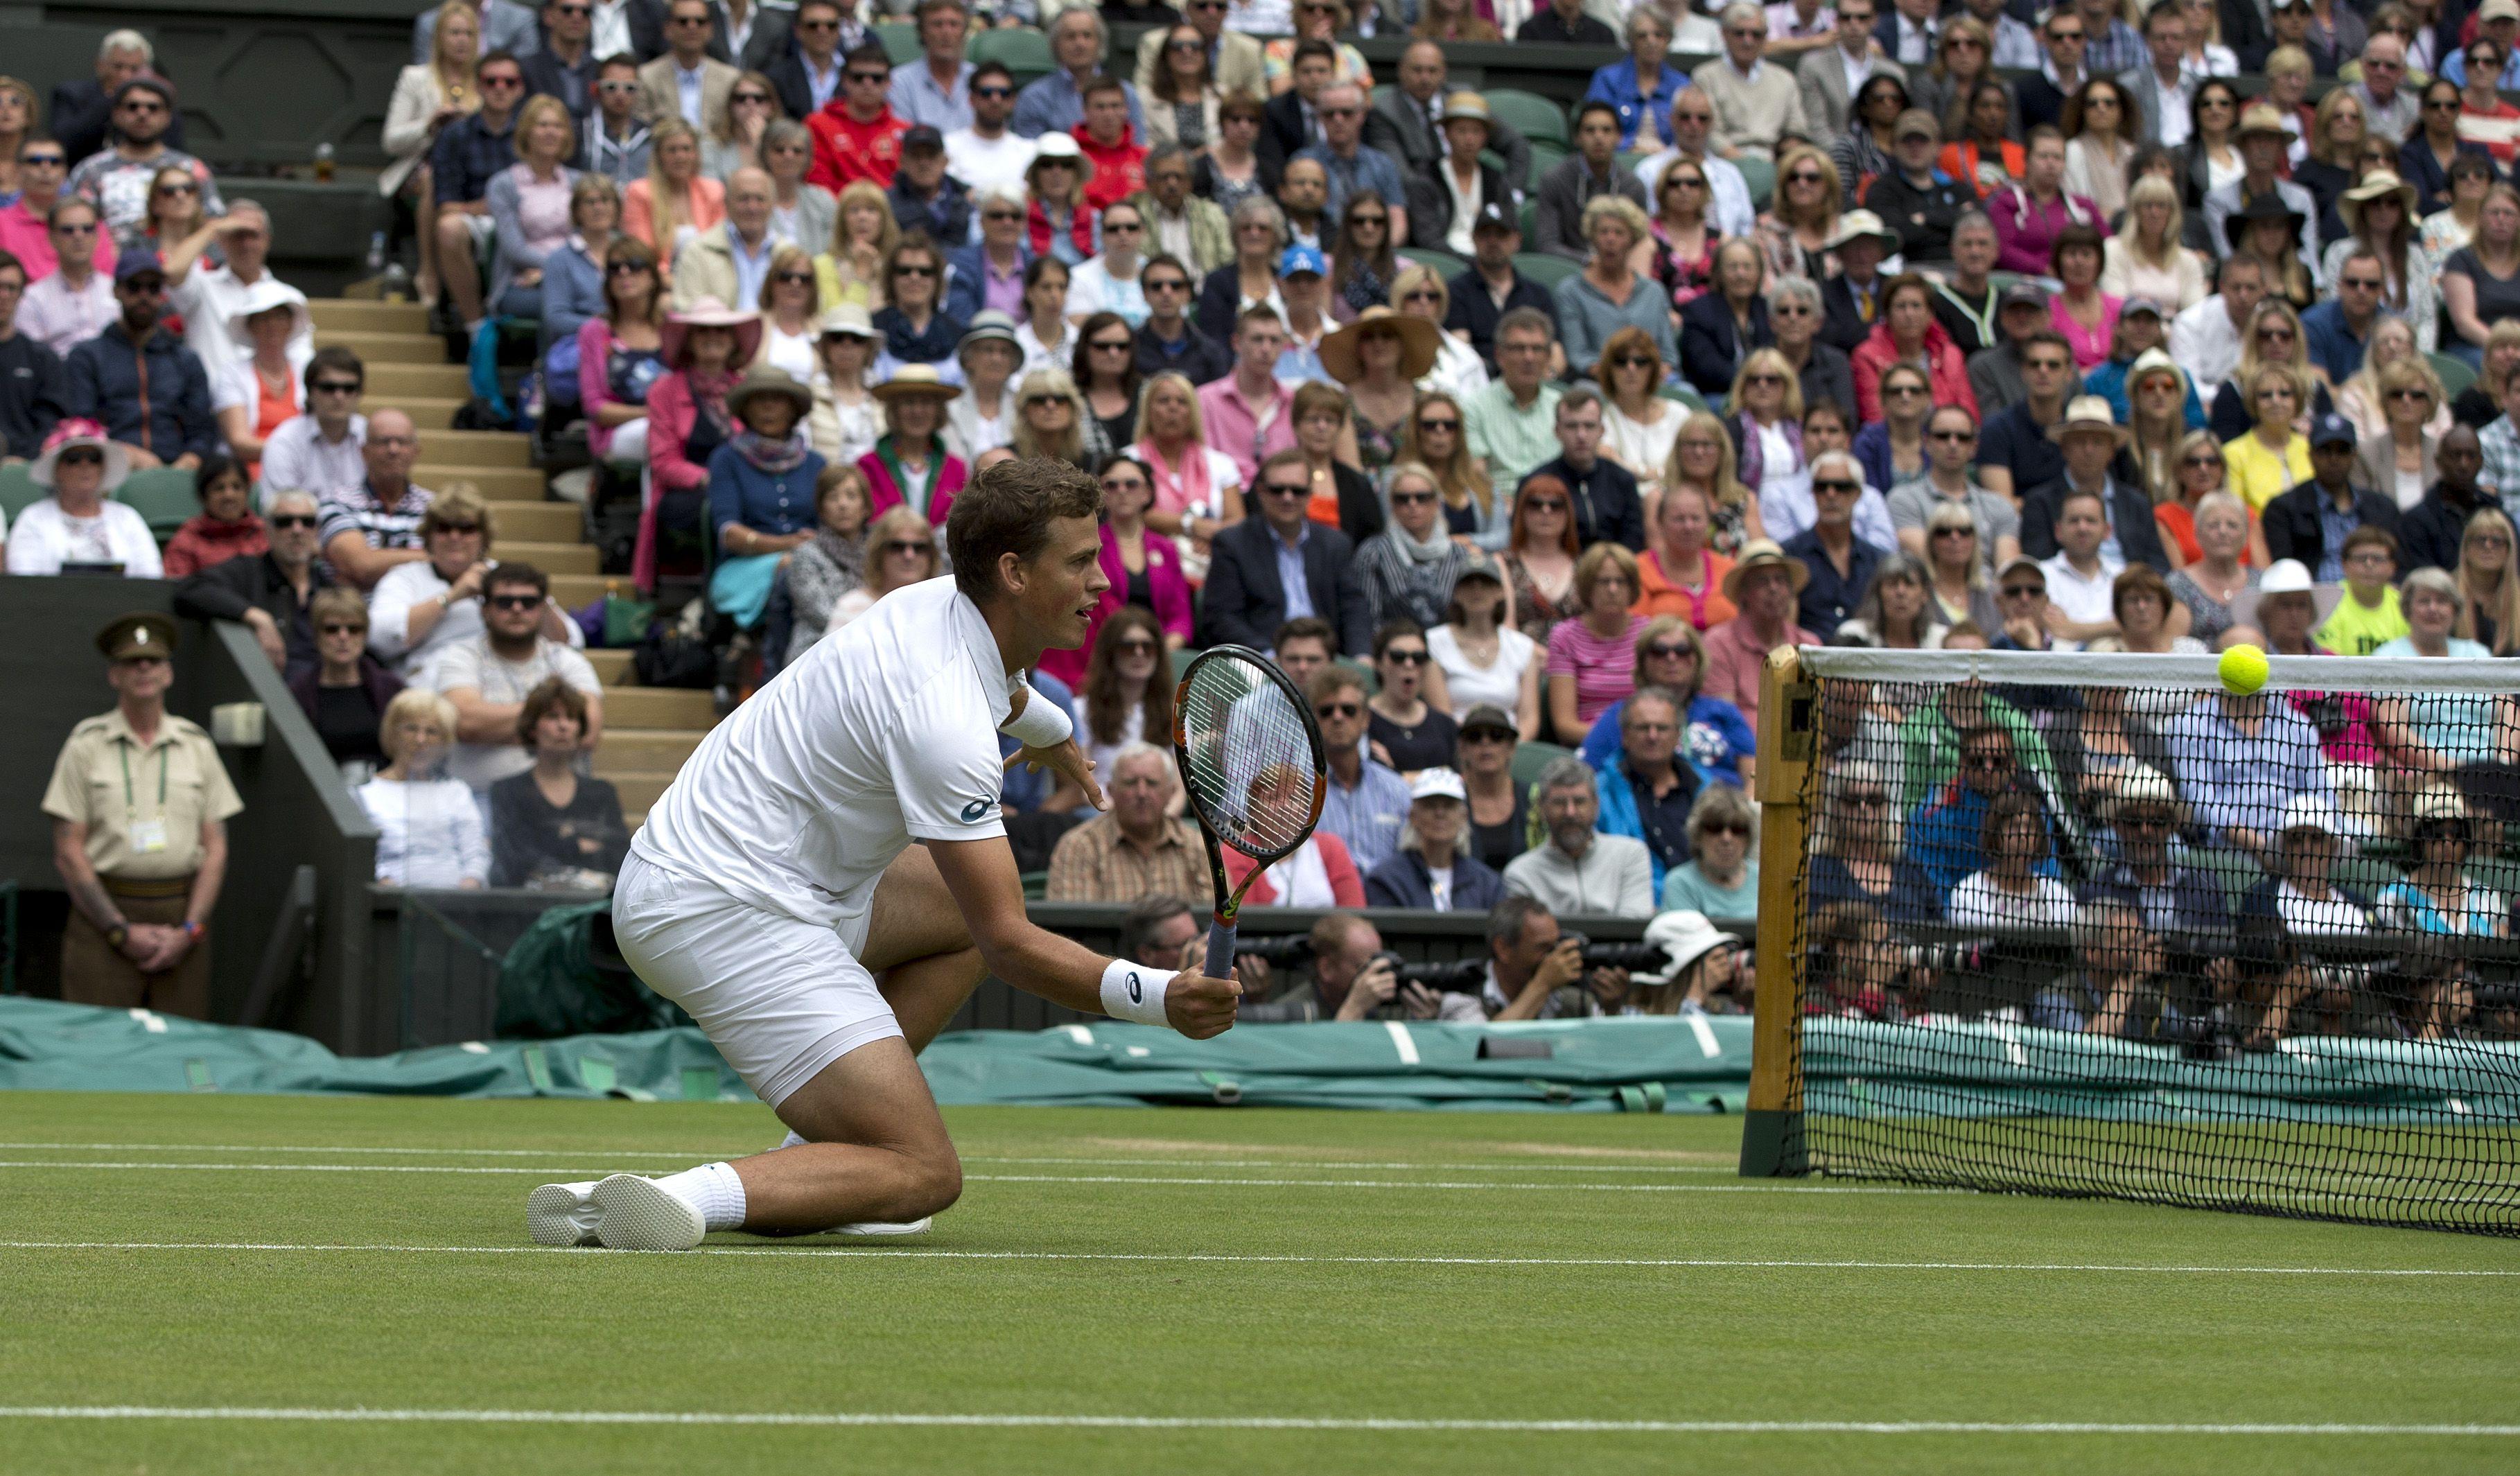 Pin On Wimbledon Tennis Championship